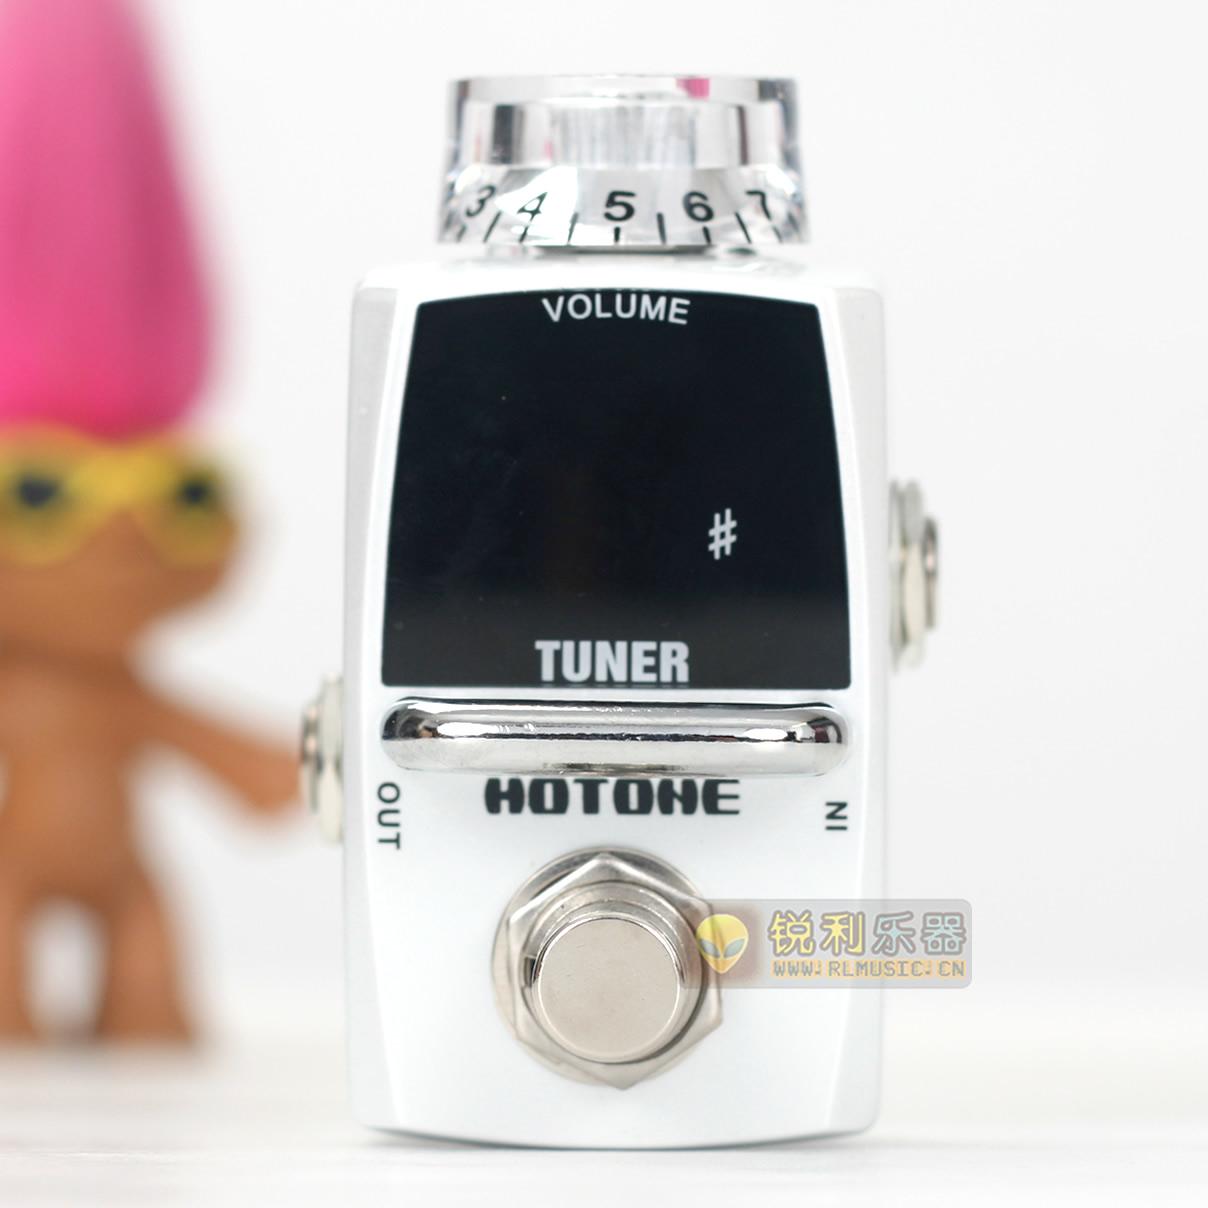 【Hotone Tuner】幻音 调音单块 清音激励效果器【锐利乐器】